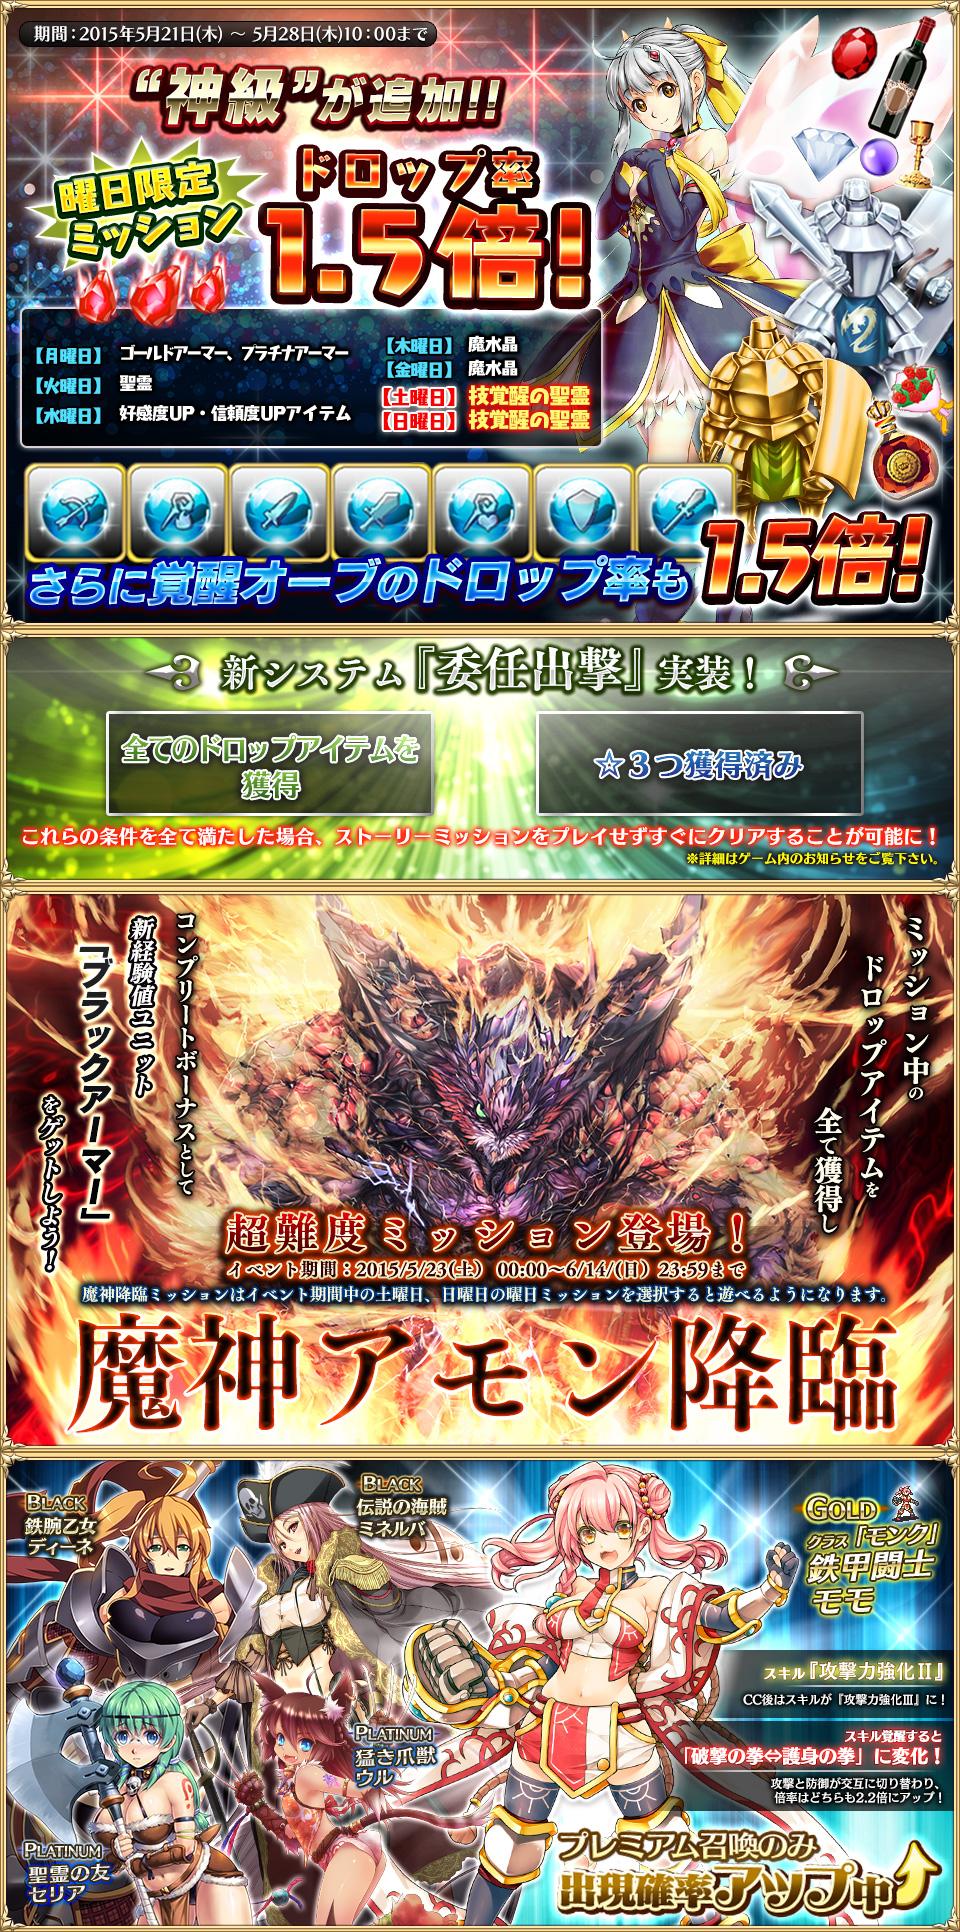 event20150520.jpg